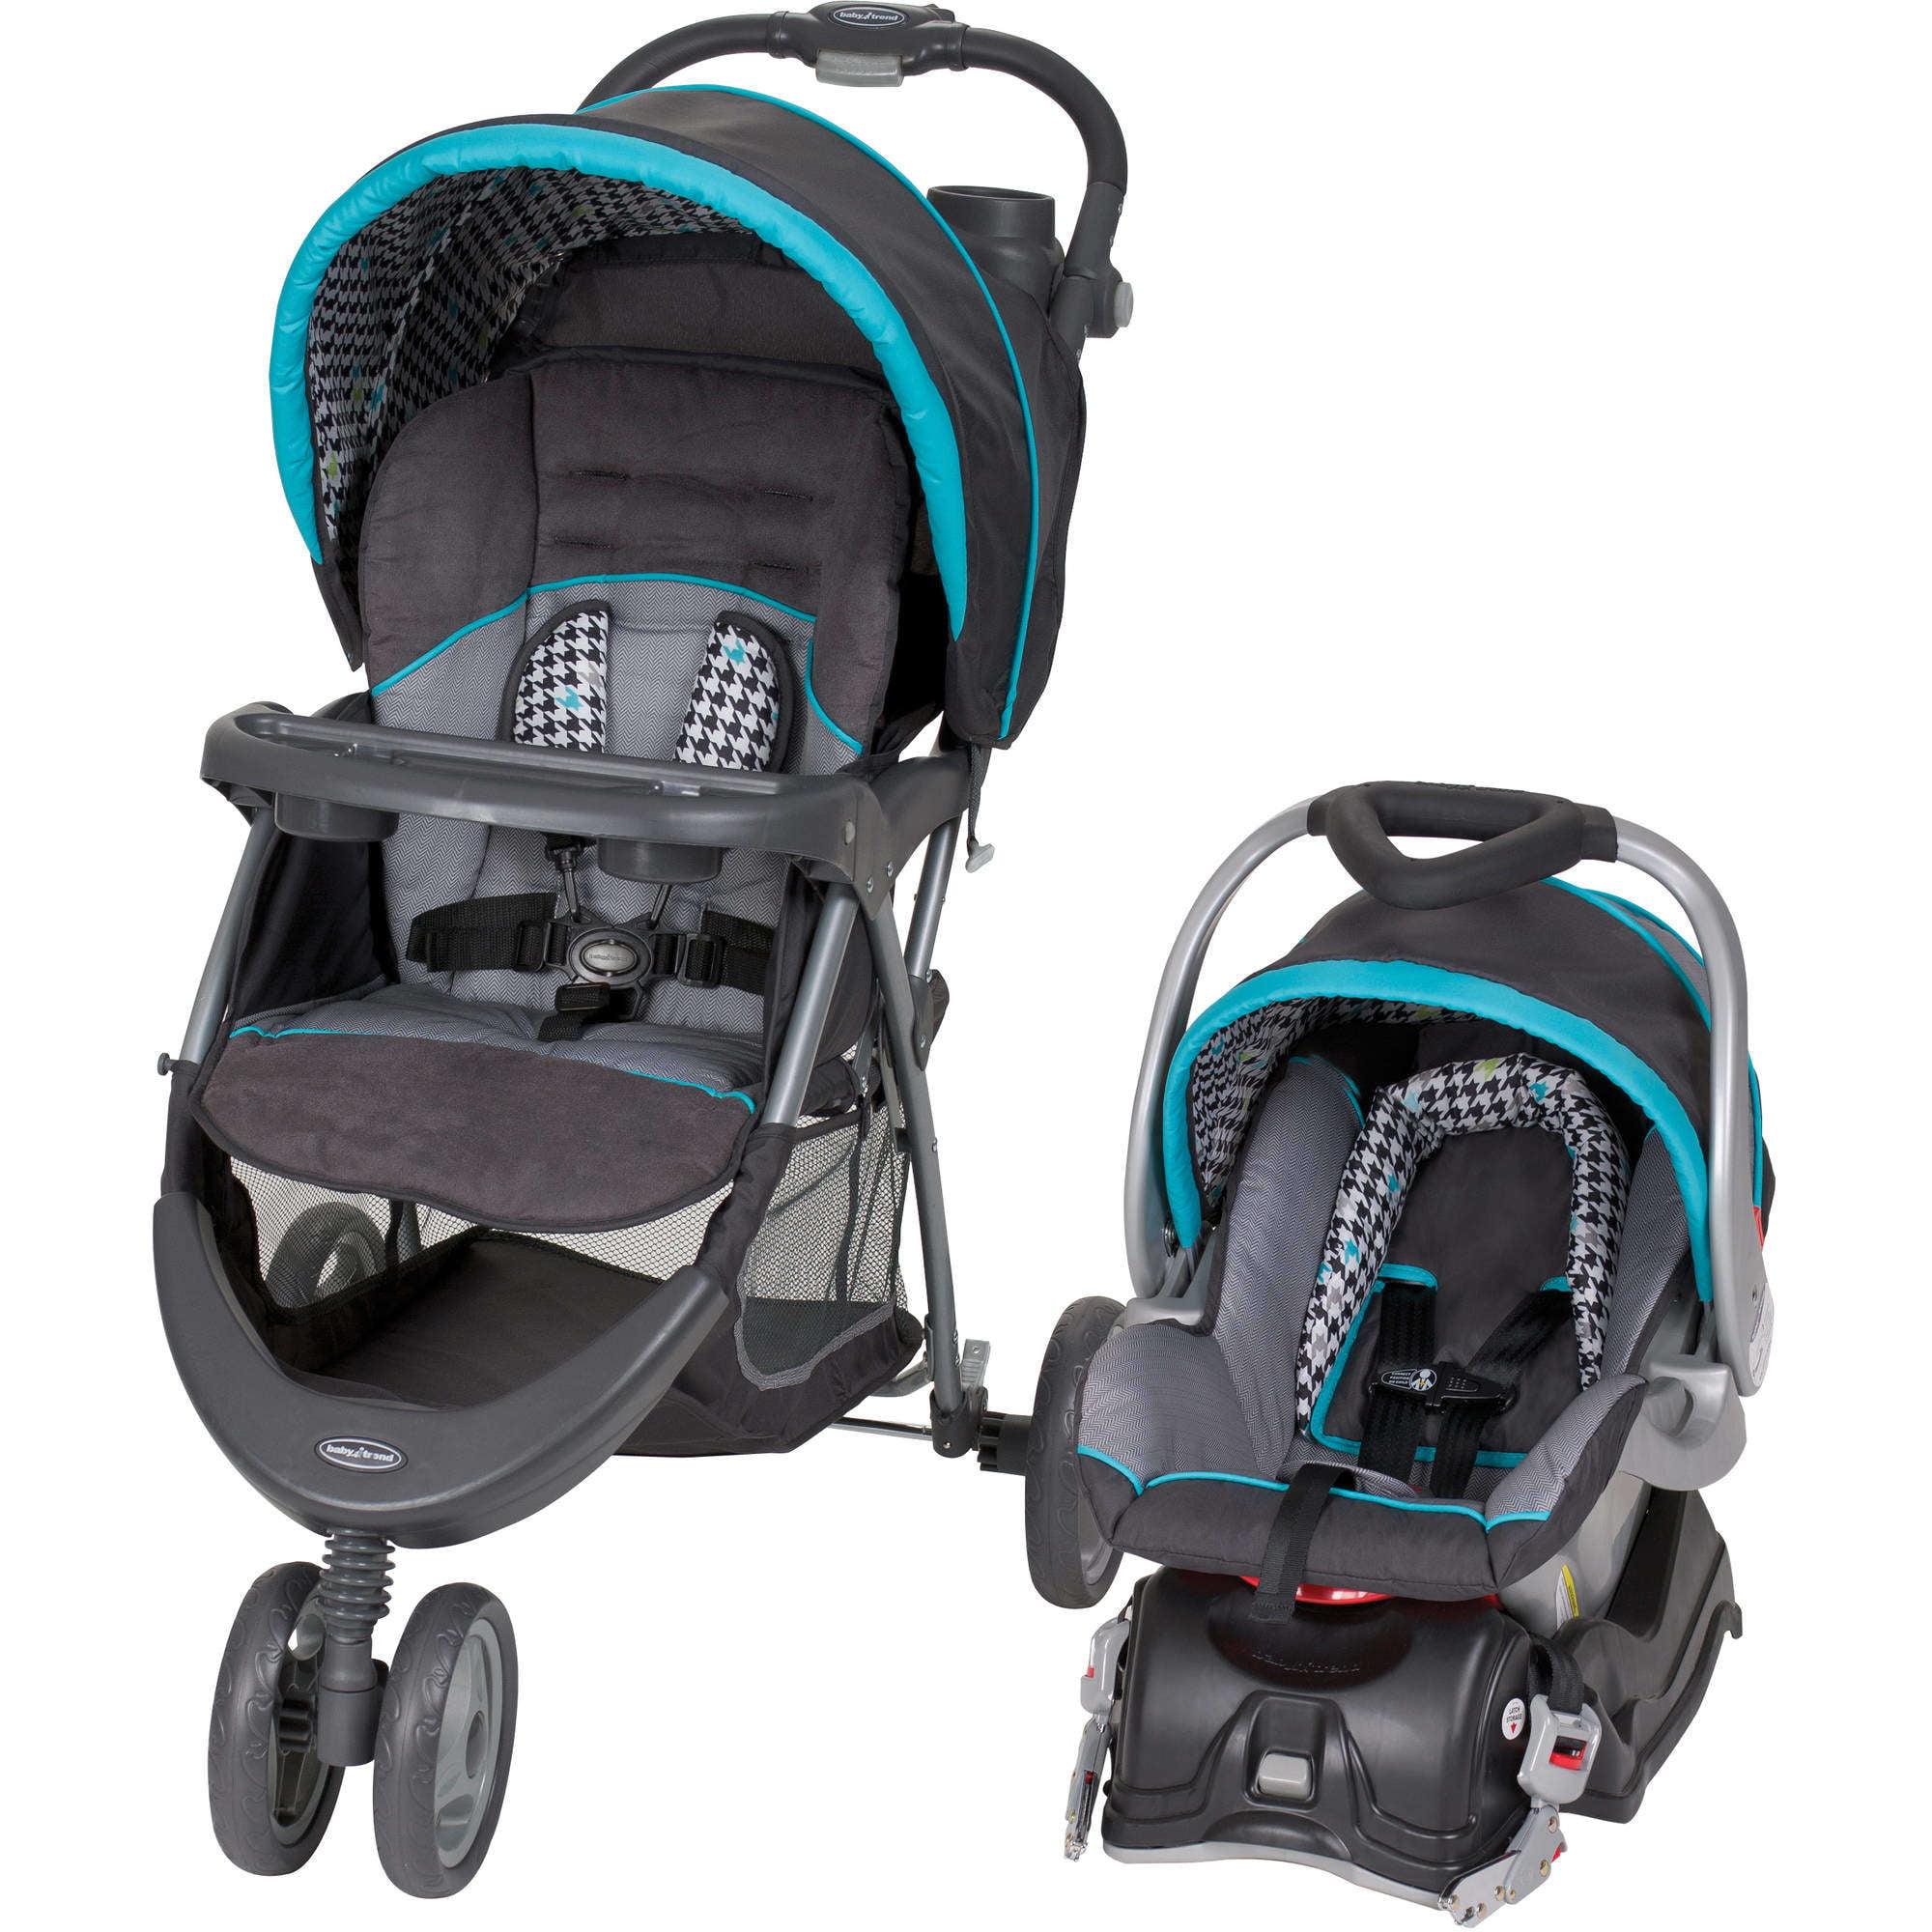 Baby Trend Ez Ride 5 Travel System Houndstooth Walmart Com